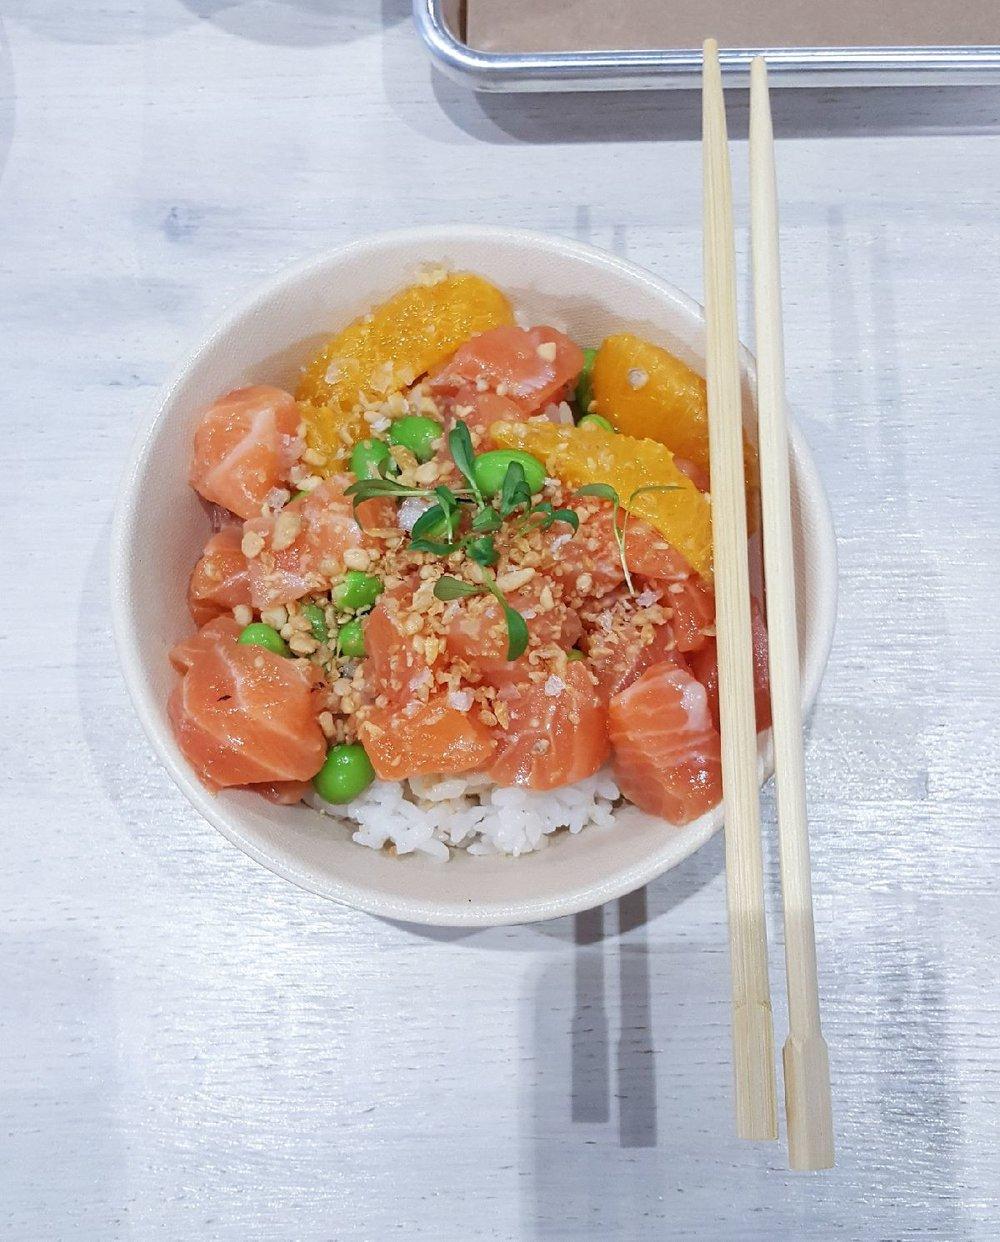 3. Salmon Ponzu - SeaSide Poke - Ponzu, Orange, Edamame, Garlic